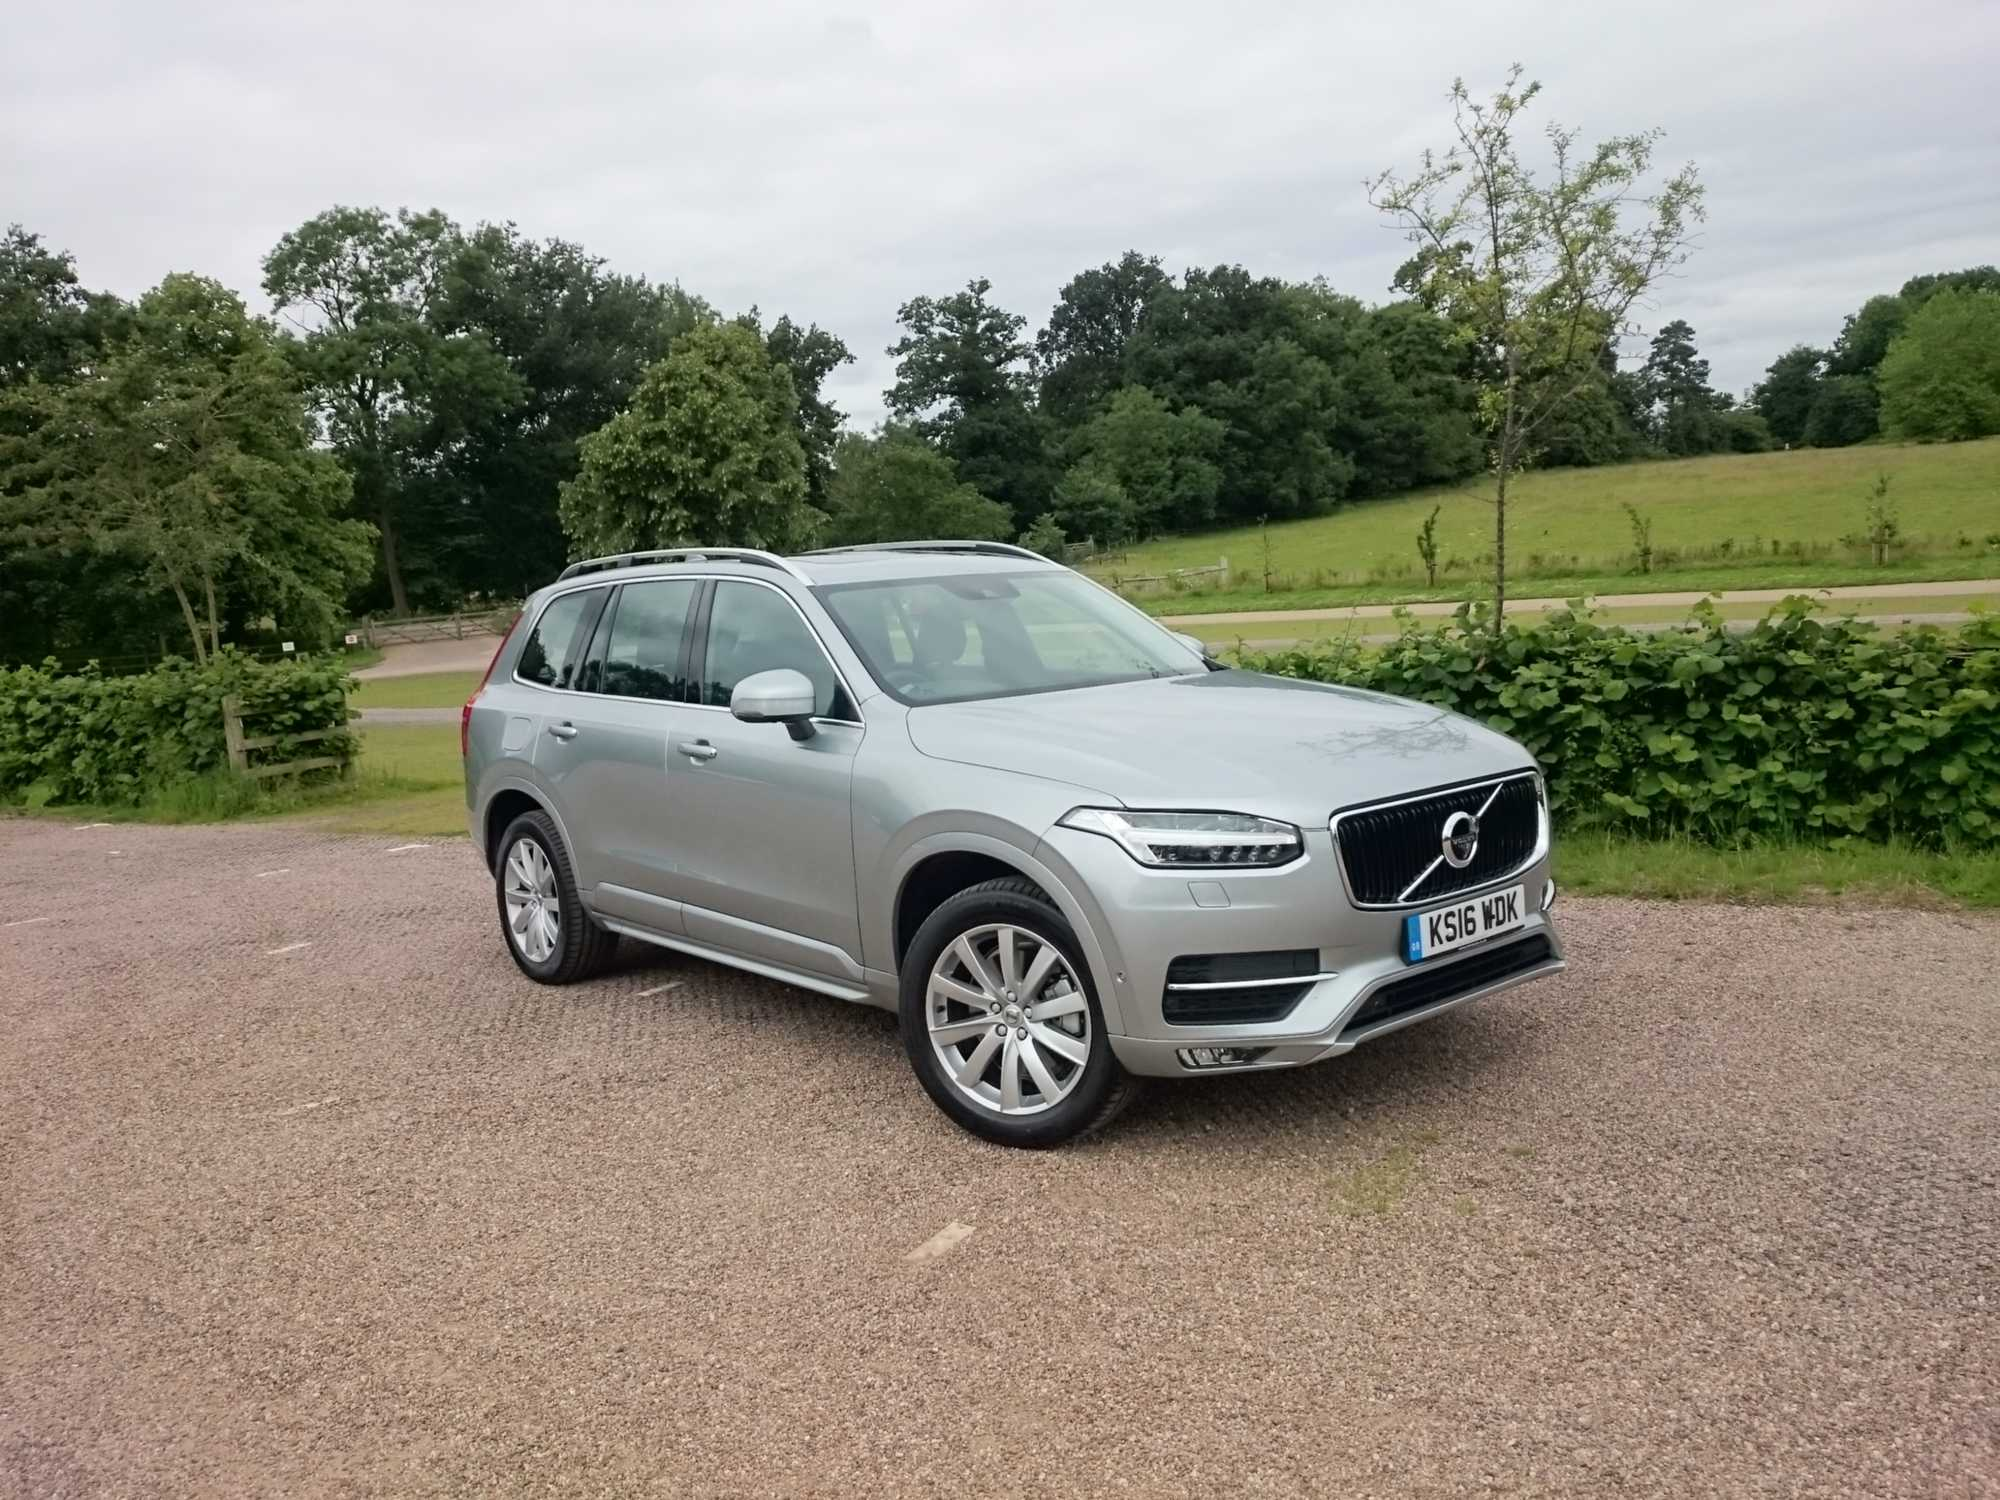 Volvo XC90 D5 AWD Power Pulse Momentum SUV review Car Keys